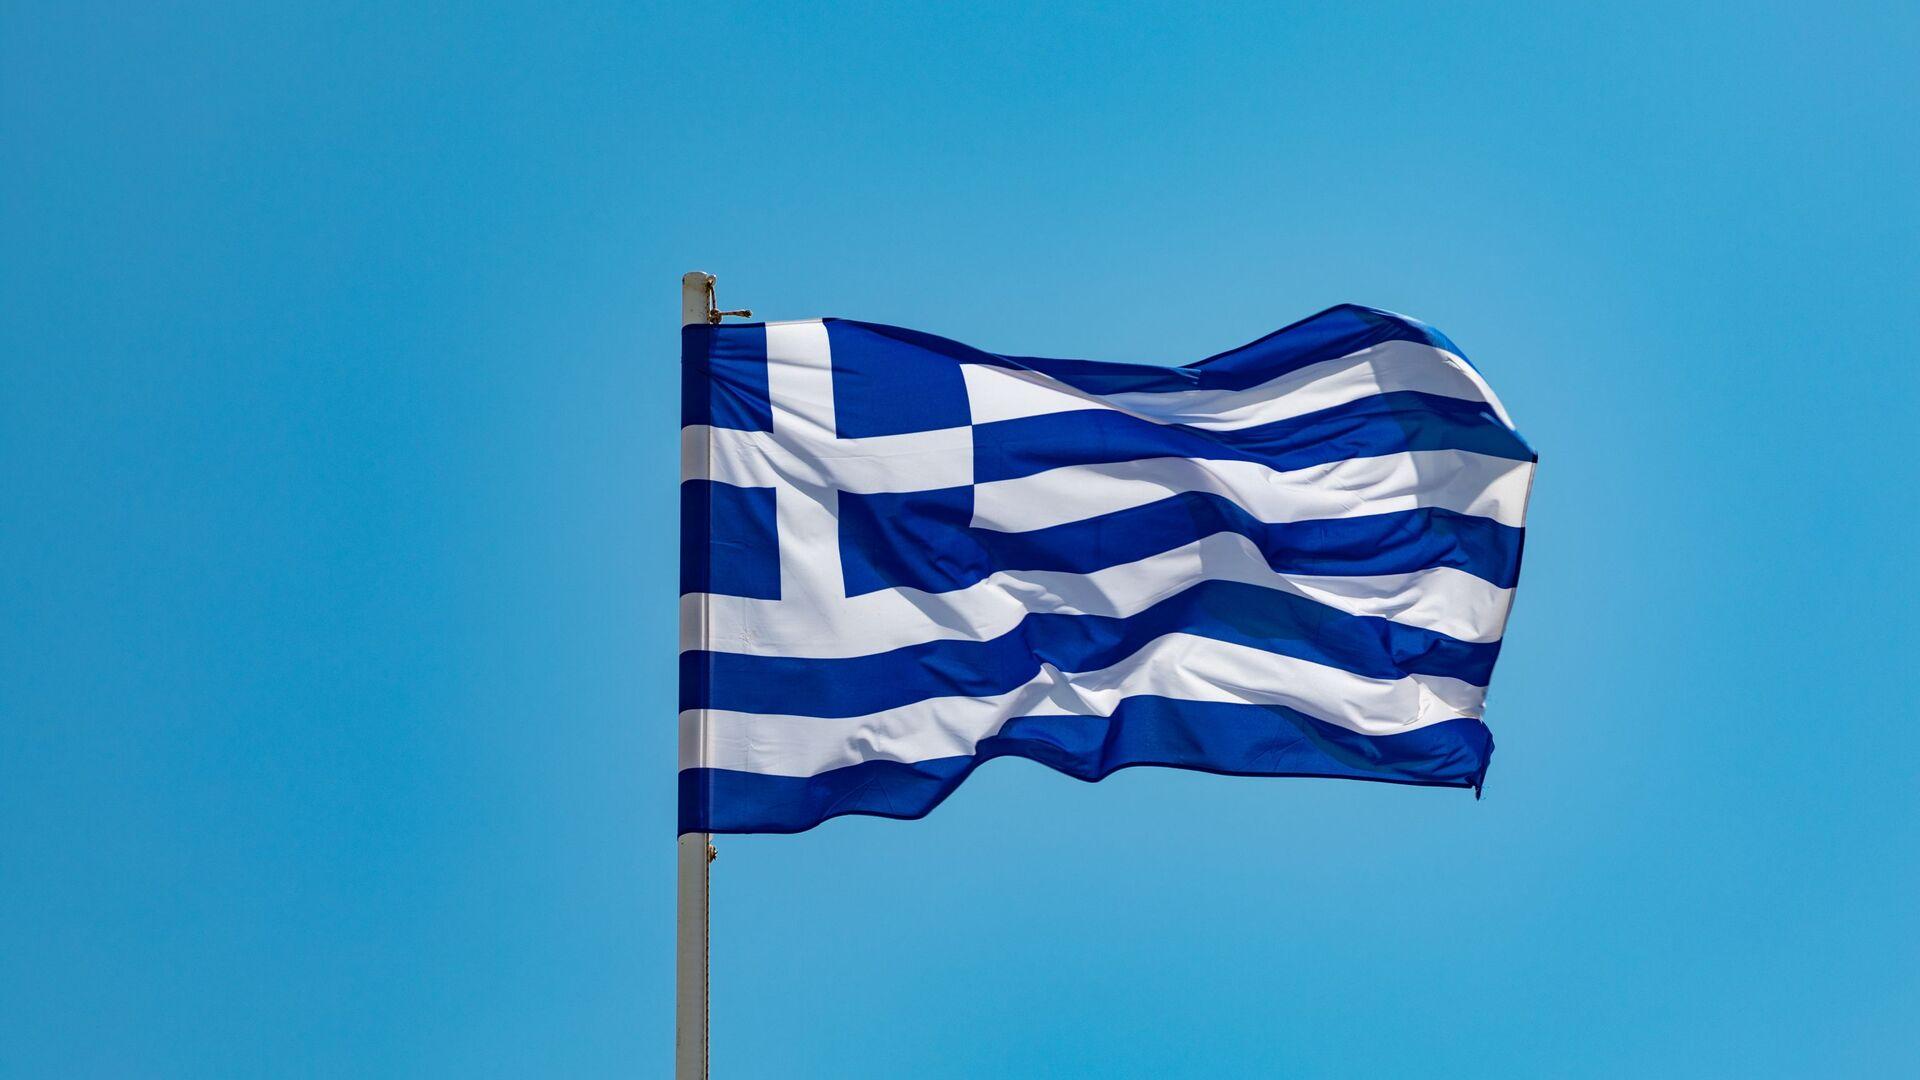 Una bandera de Grecia - Sputnik Mundo, 1920, 22.03.2021